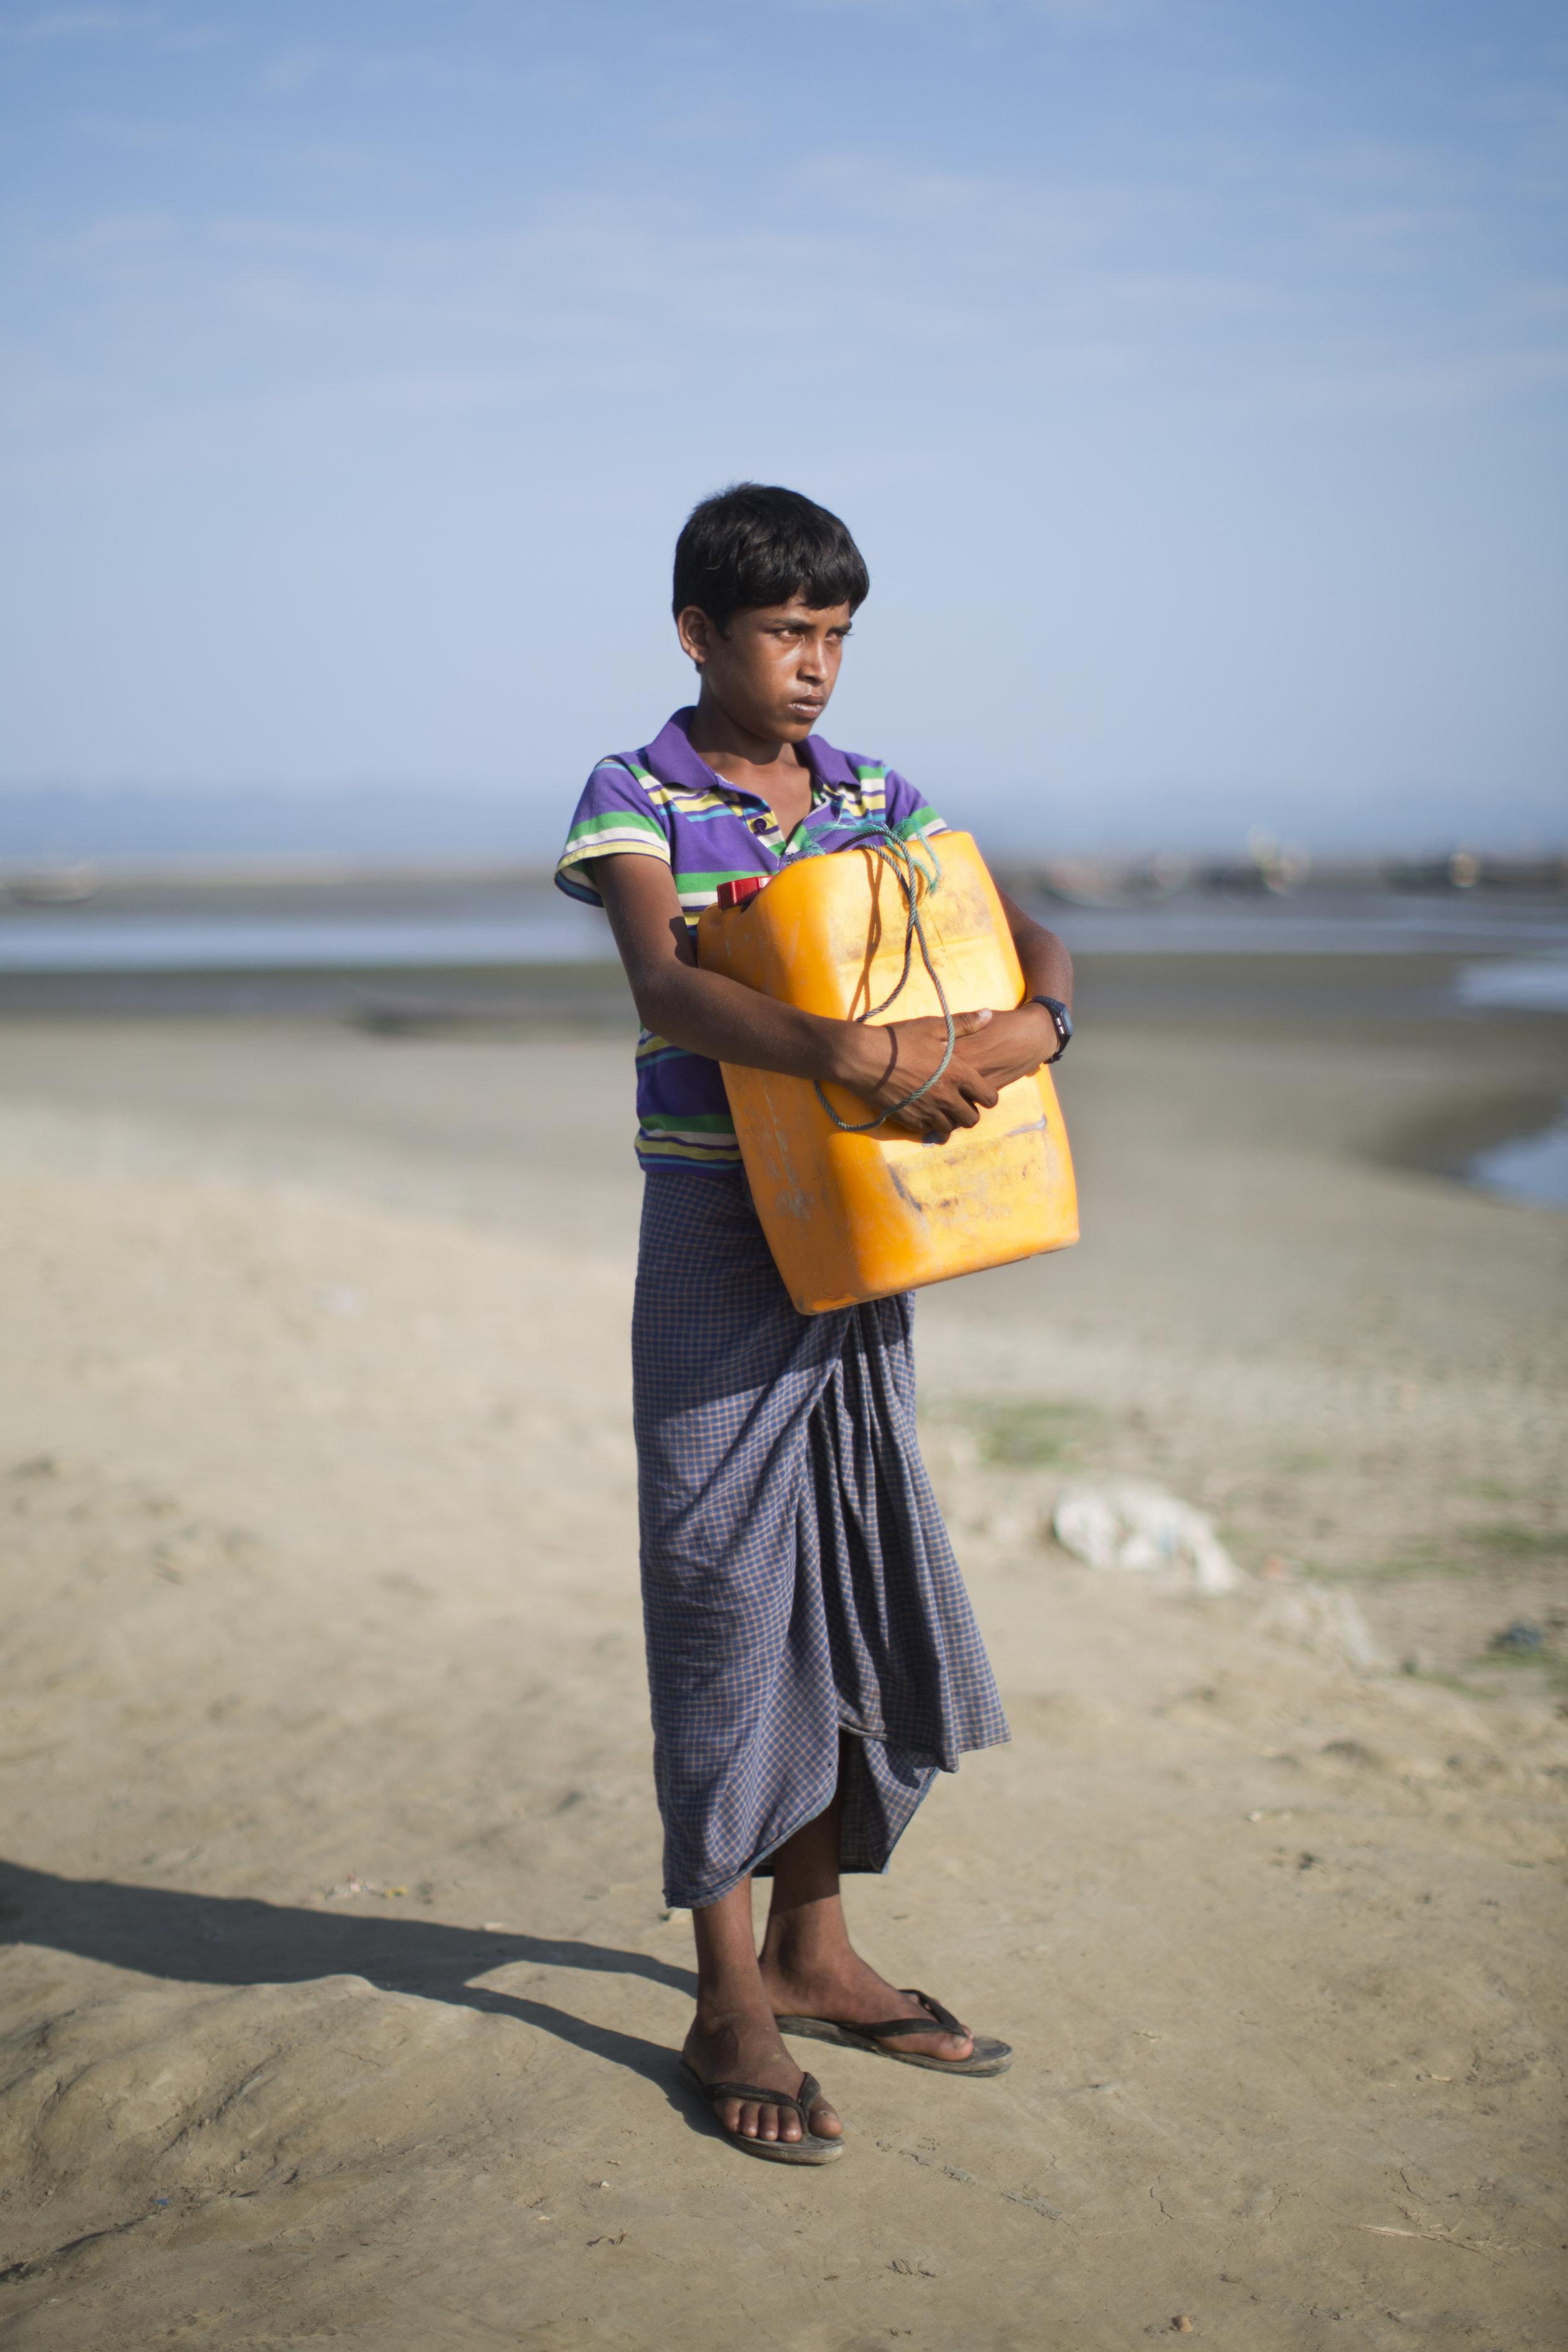 Nabi Hussain, 13. (AP Photo/Bernat Armangue)